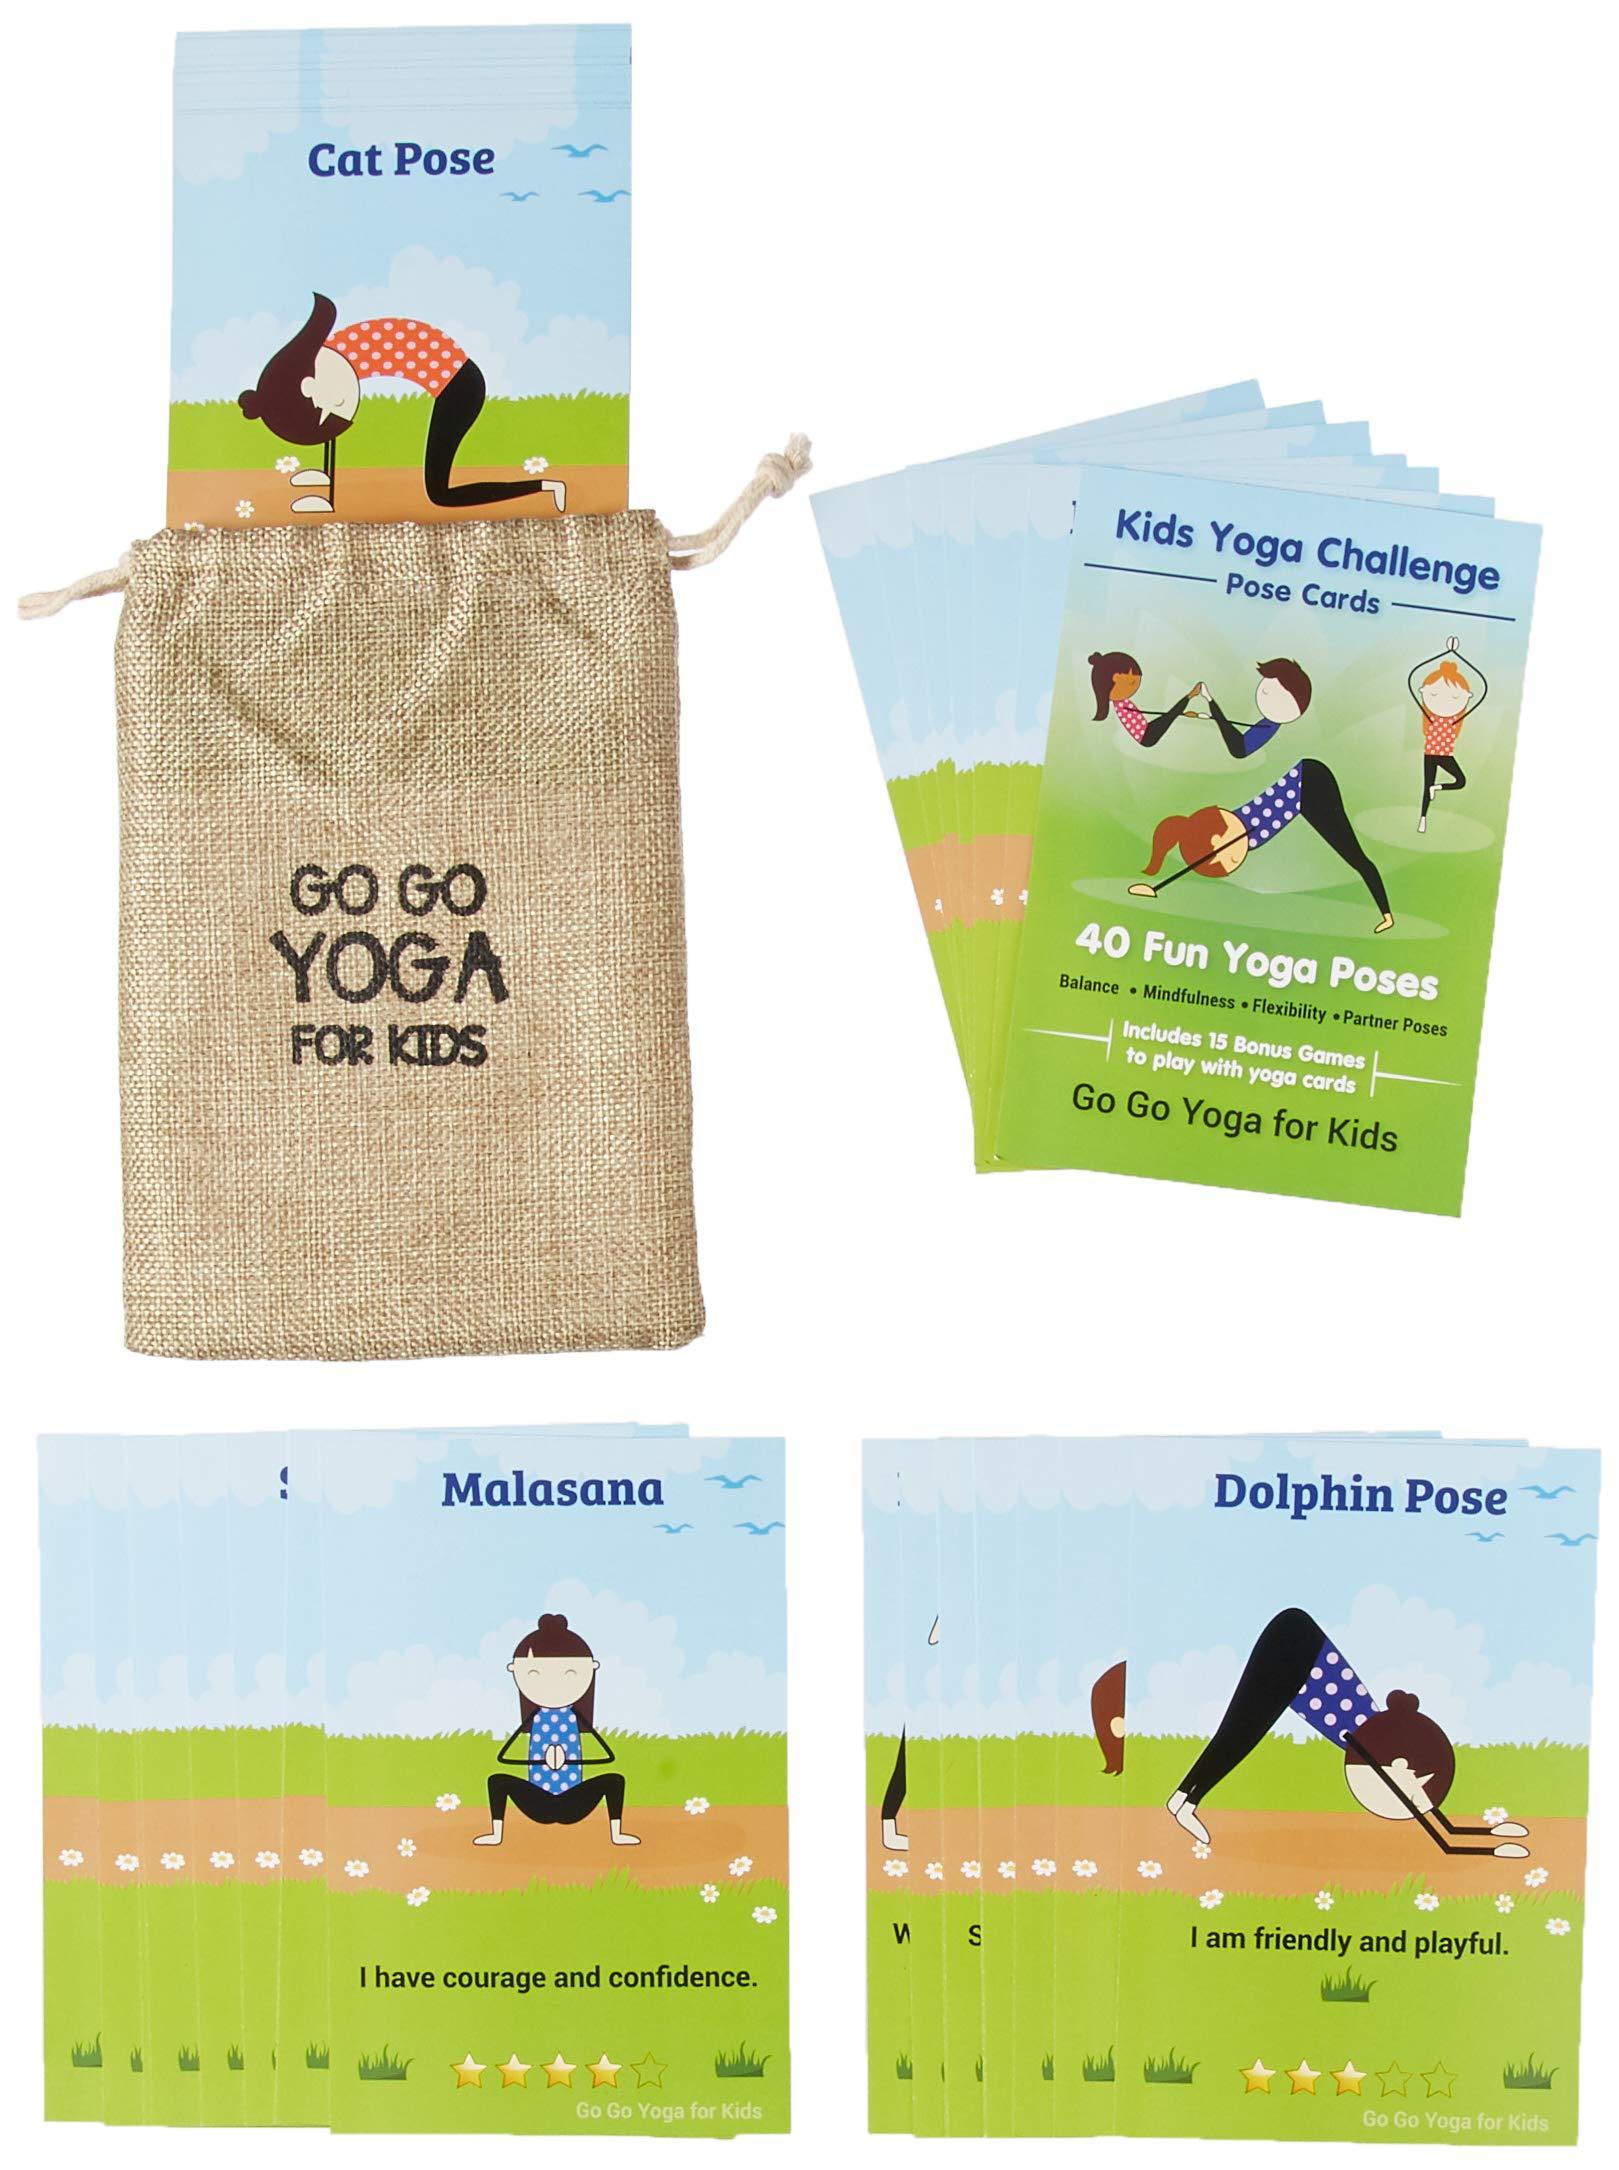 Kids Yoga Challenge Pose Cards Sara J Weis 9780998213194 Amazon Com Books